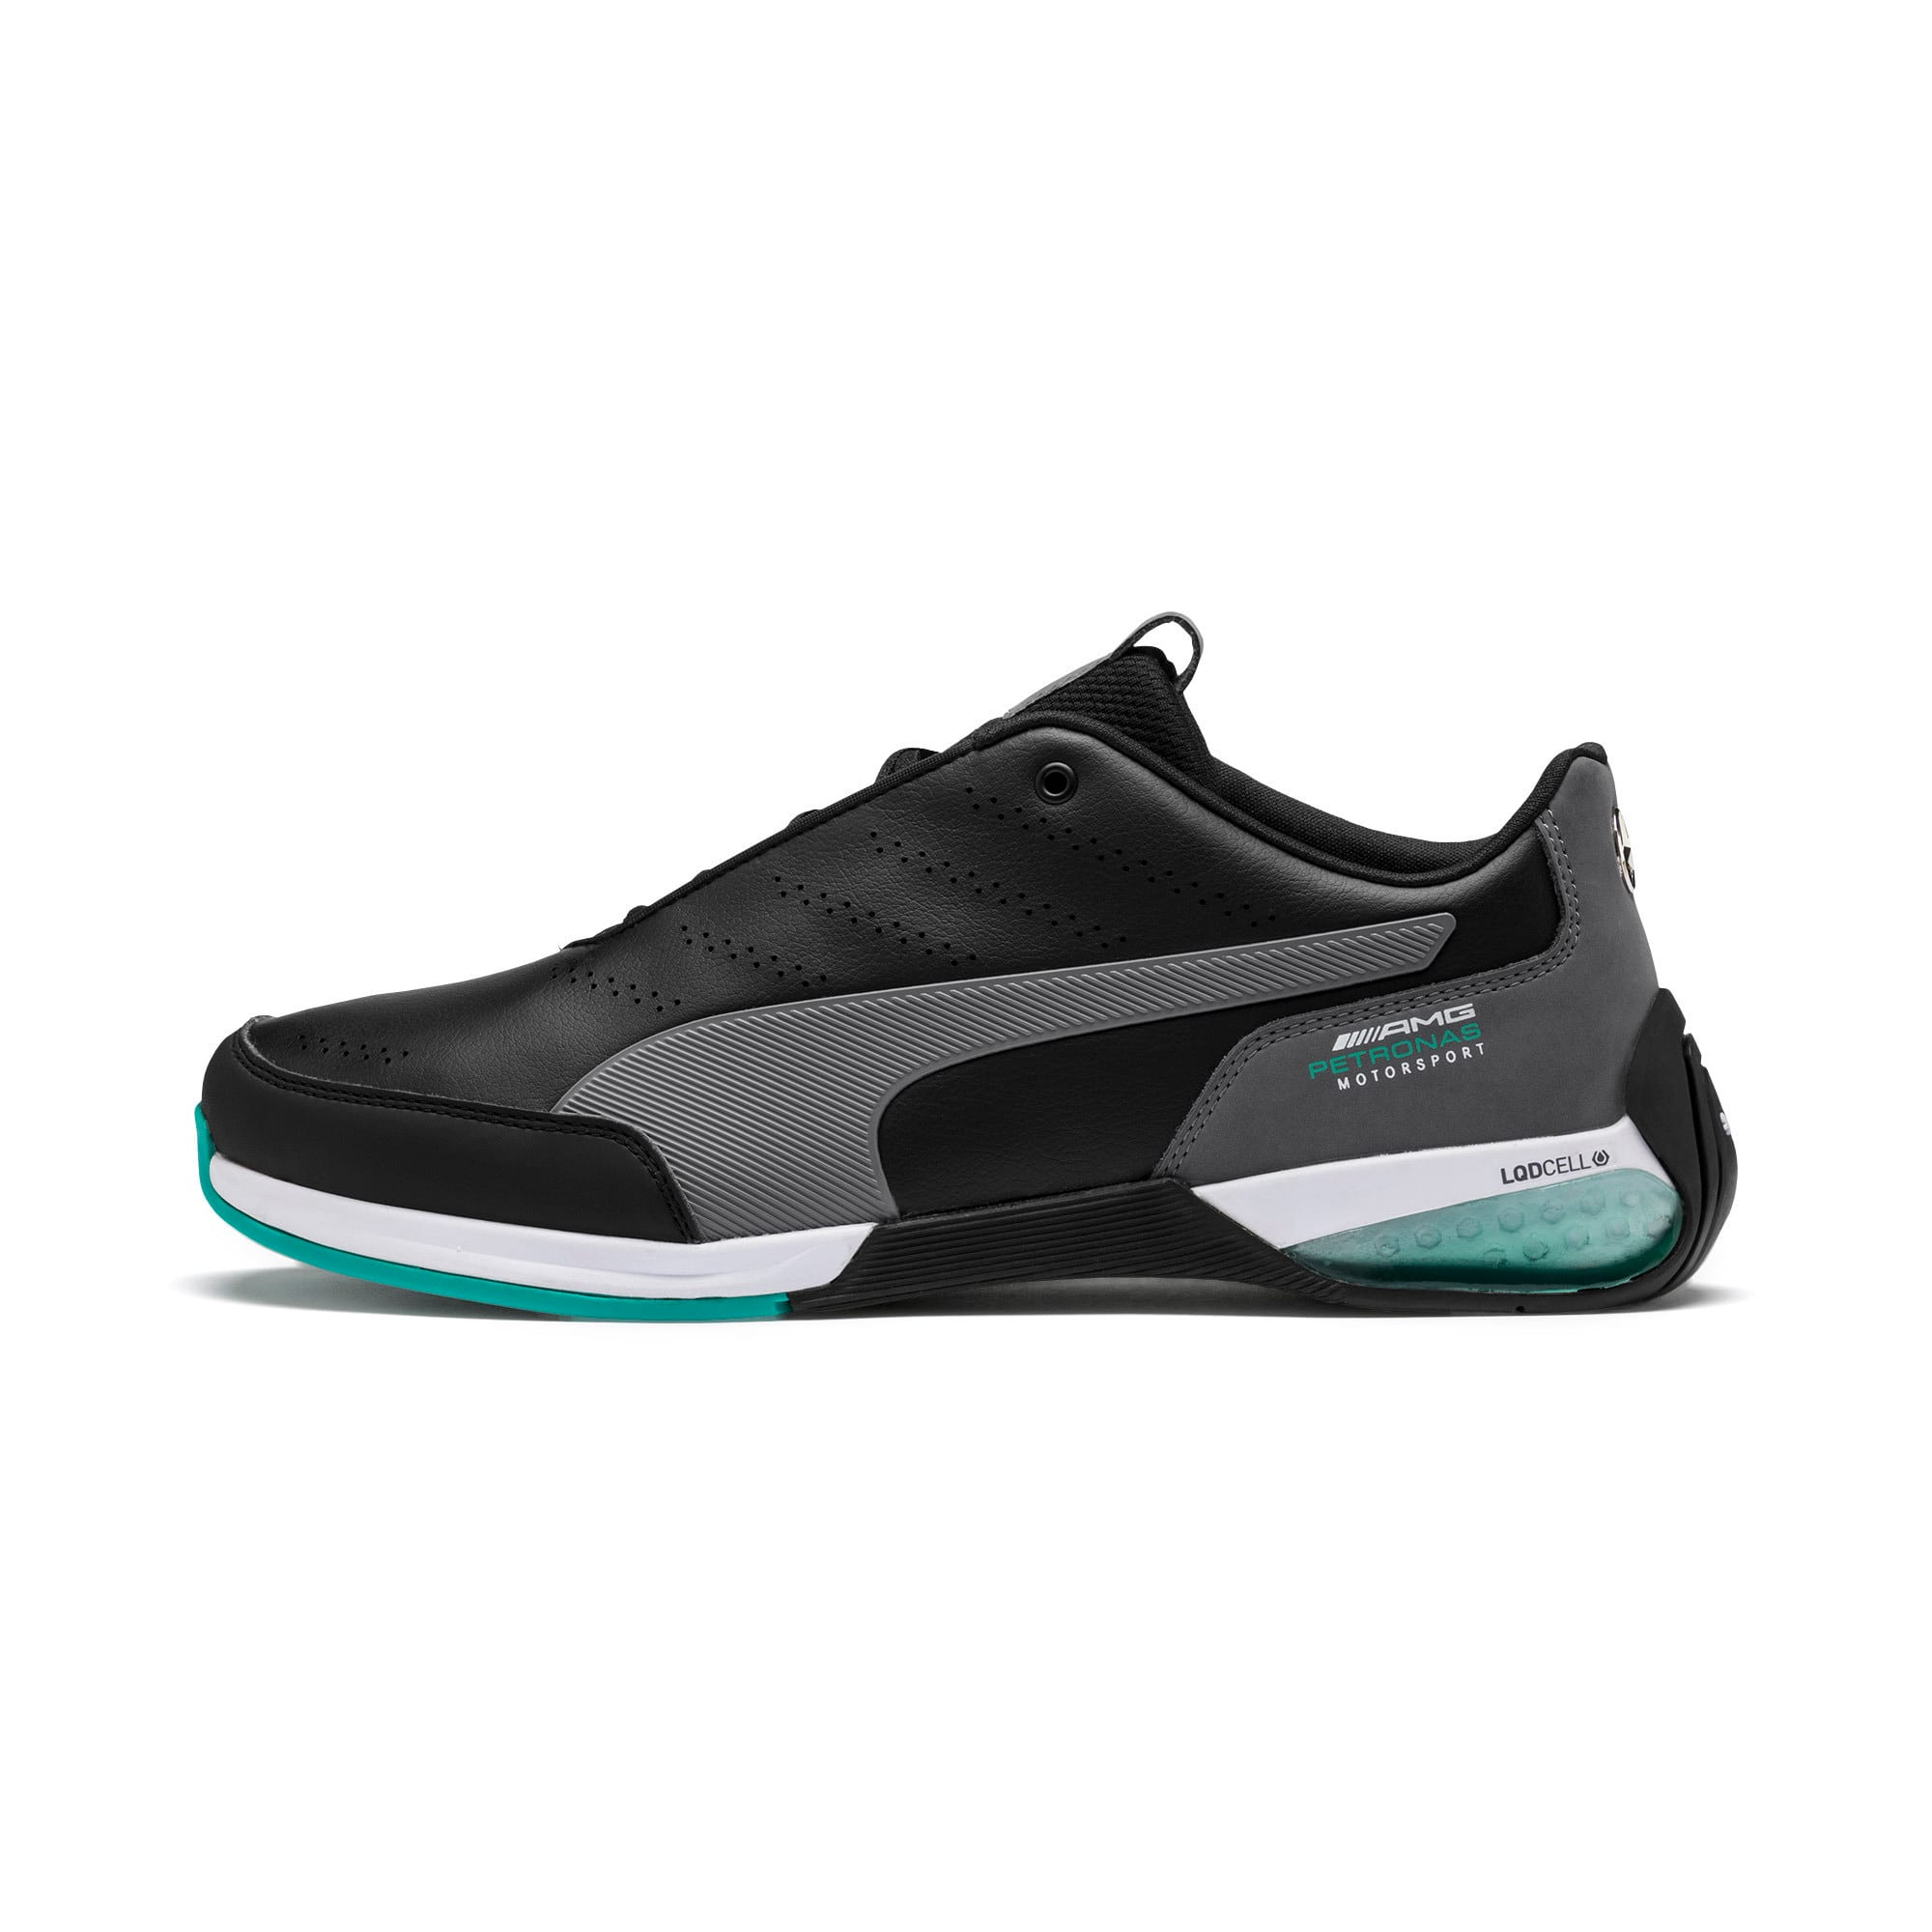 Thumbnail 1 of Mercedes AMG Petronas Kart Cat X Men's Training Shoes, Puma Black-Smoked Pearl, medium